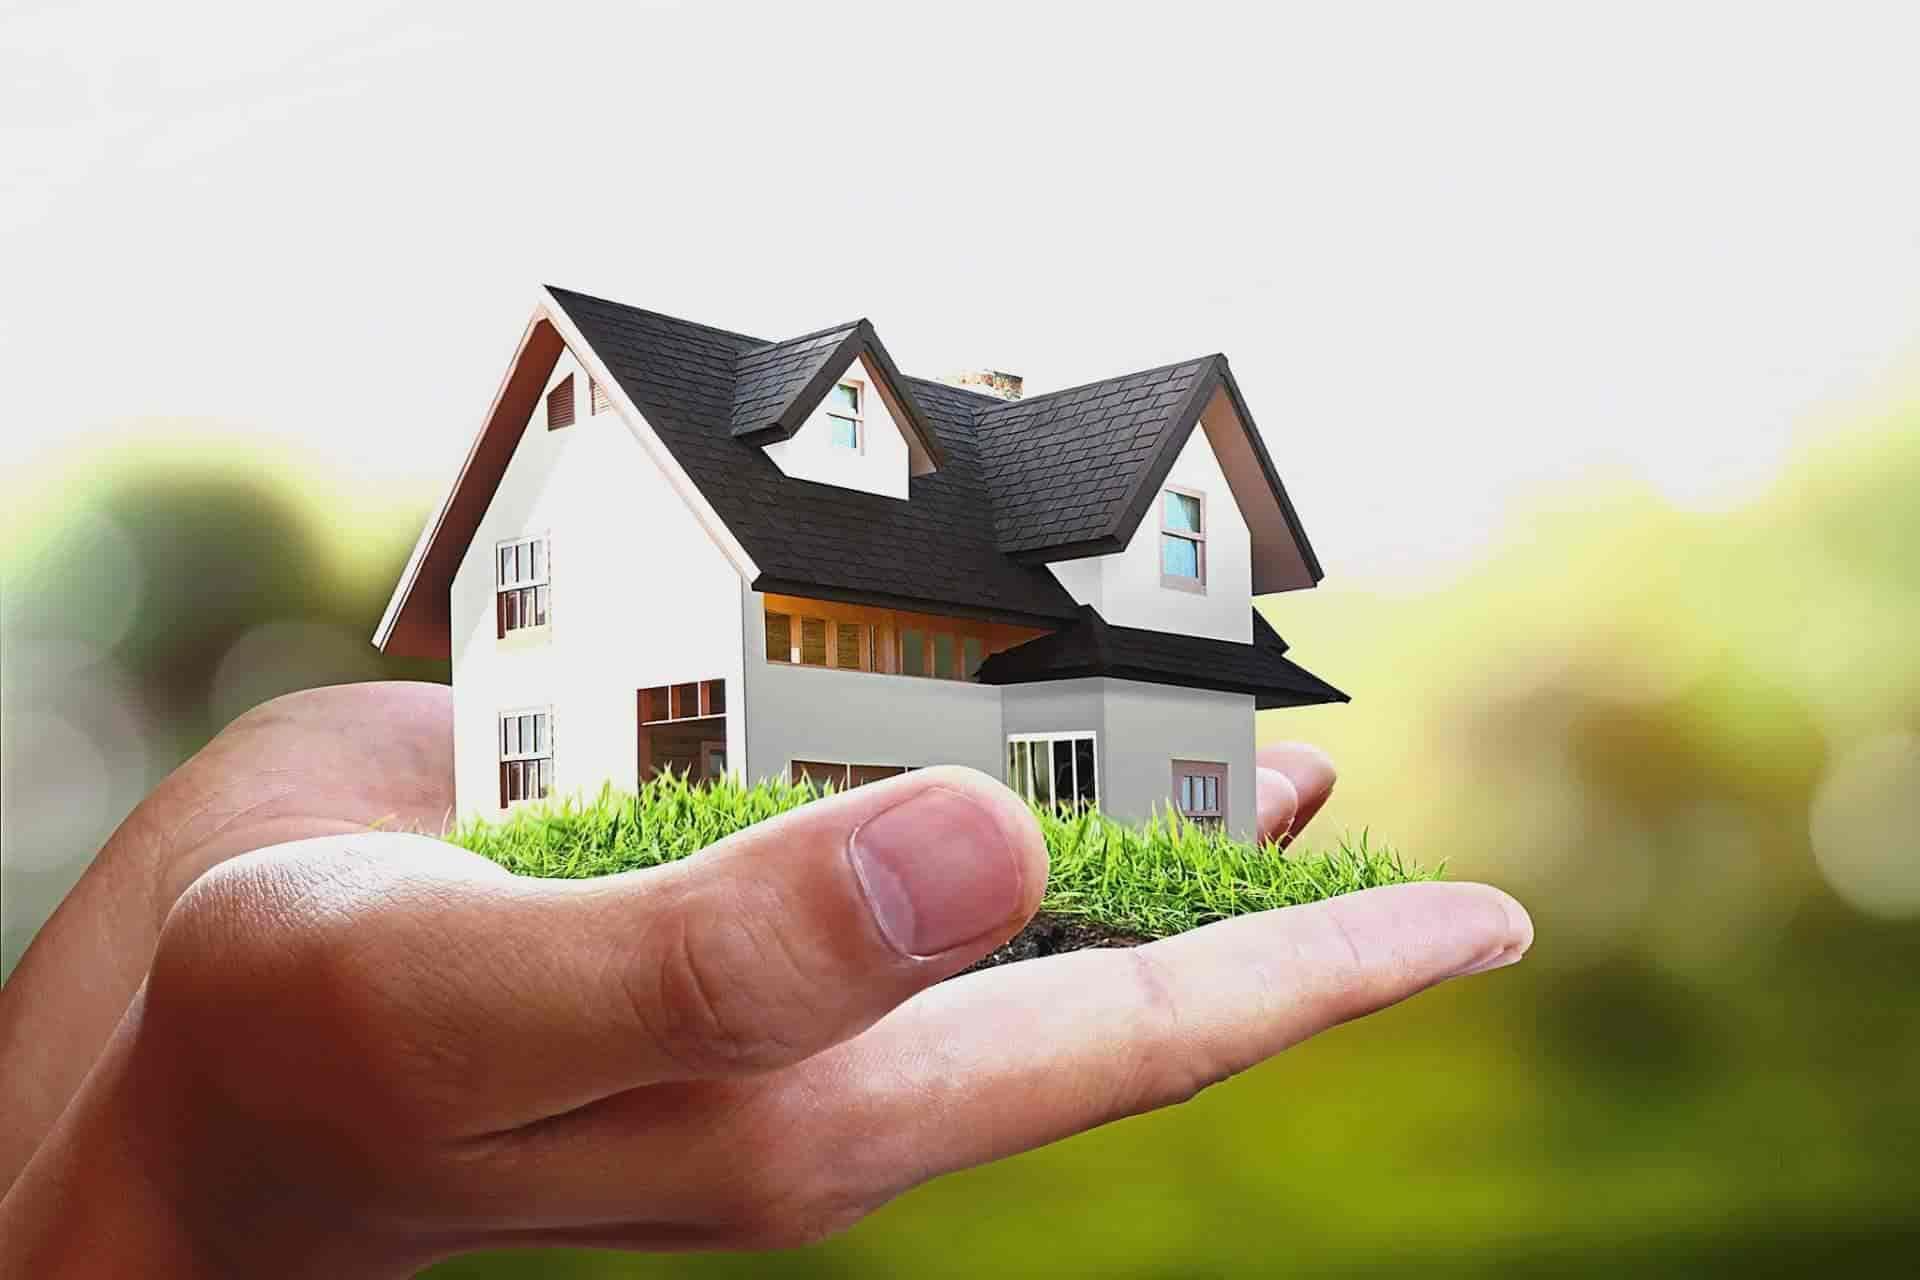 Ajay Real Estate, Dwarka Sector 10 - Estate Agents For Residential Rental  in Delhi - Justdial